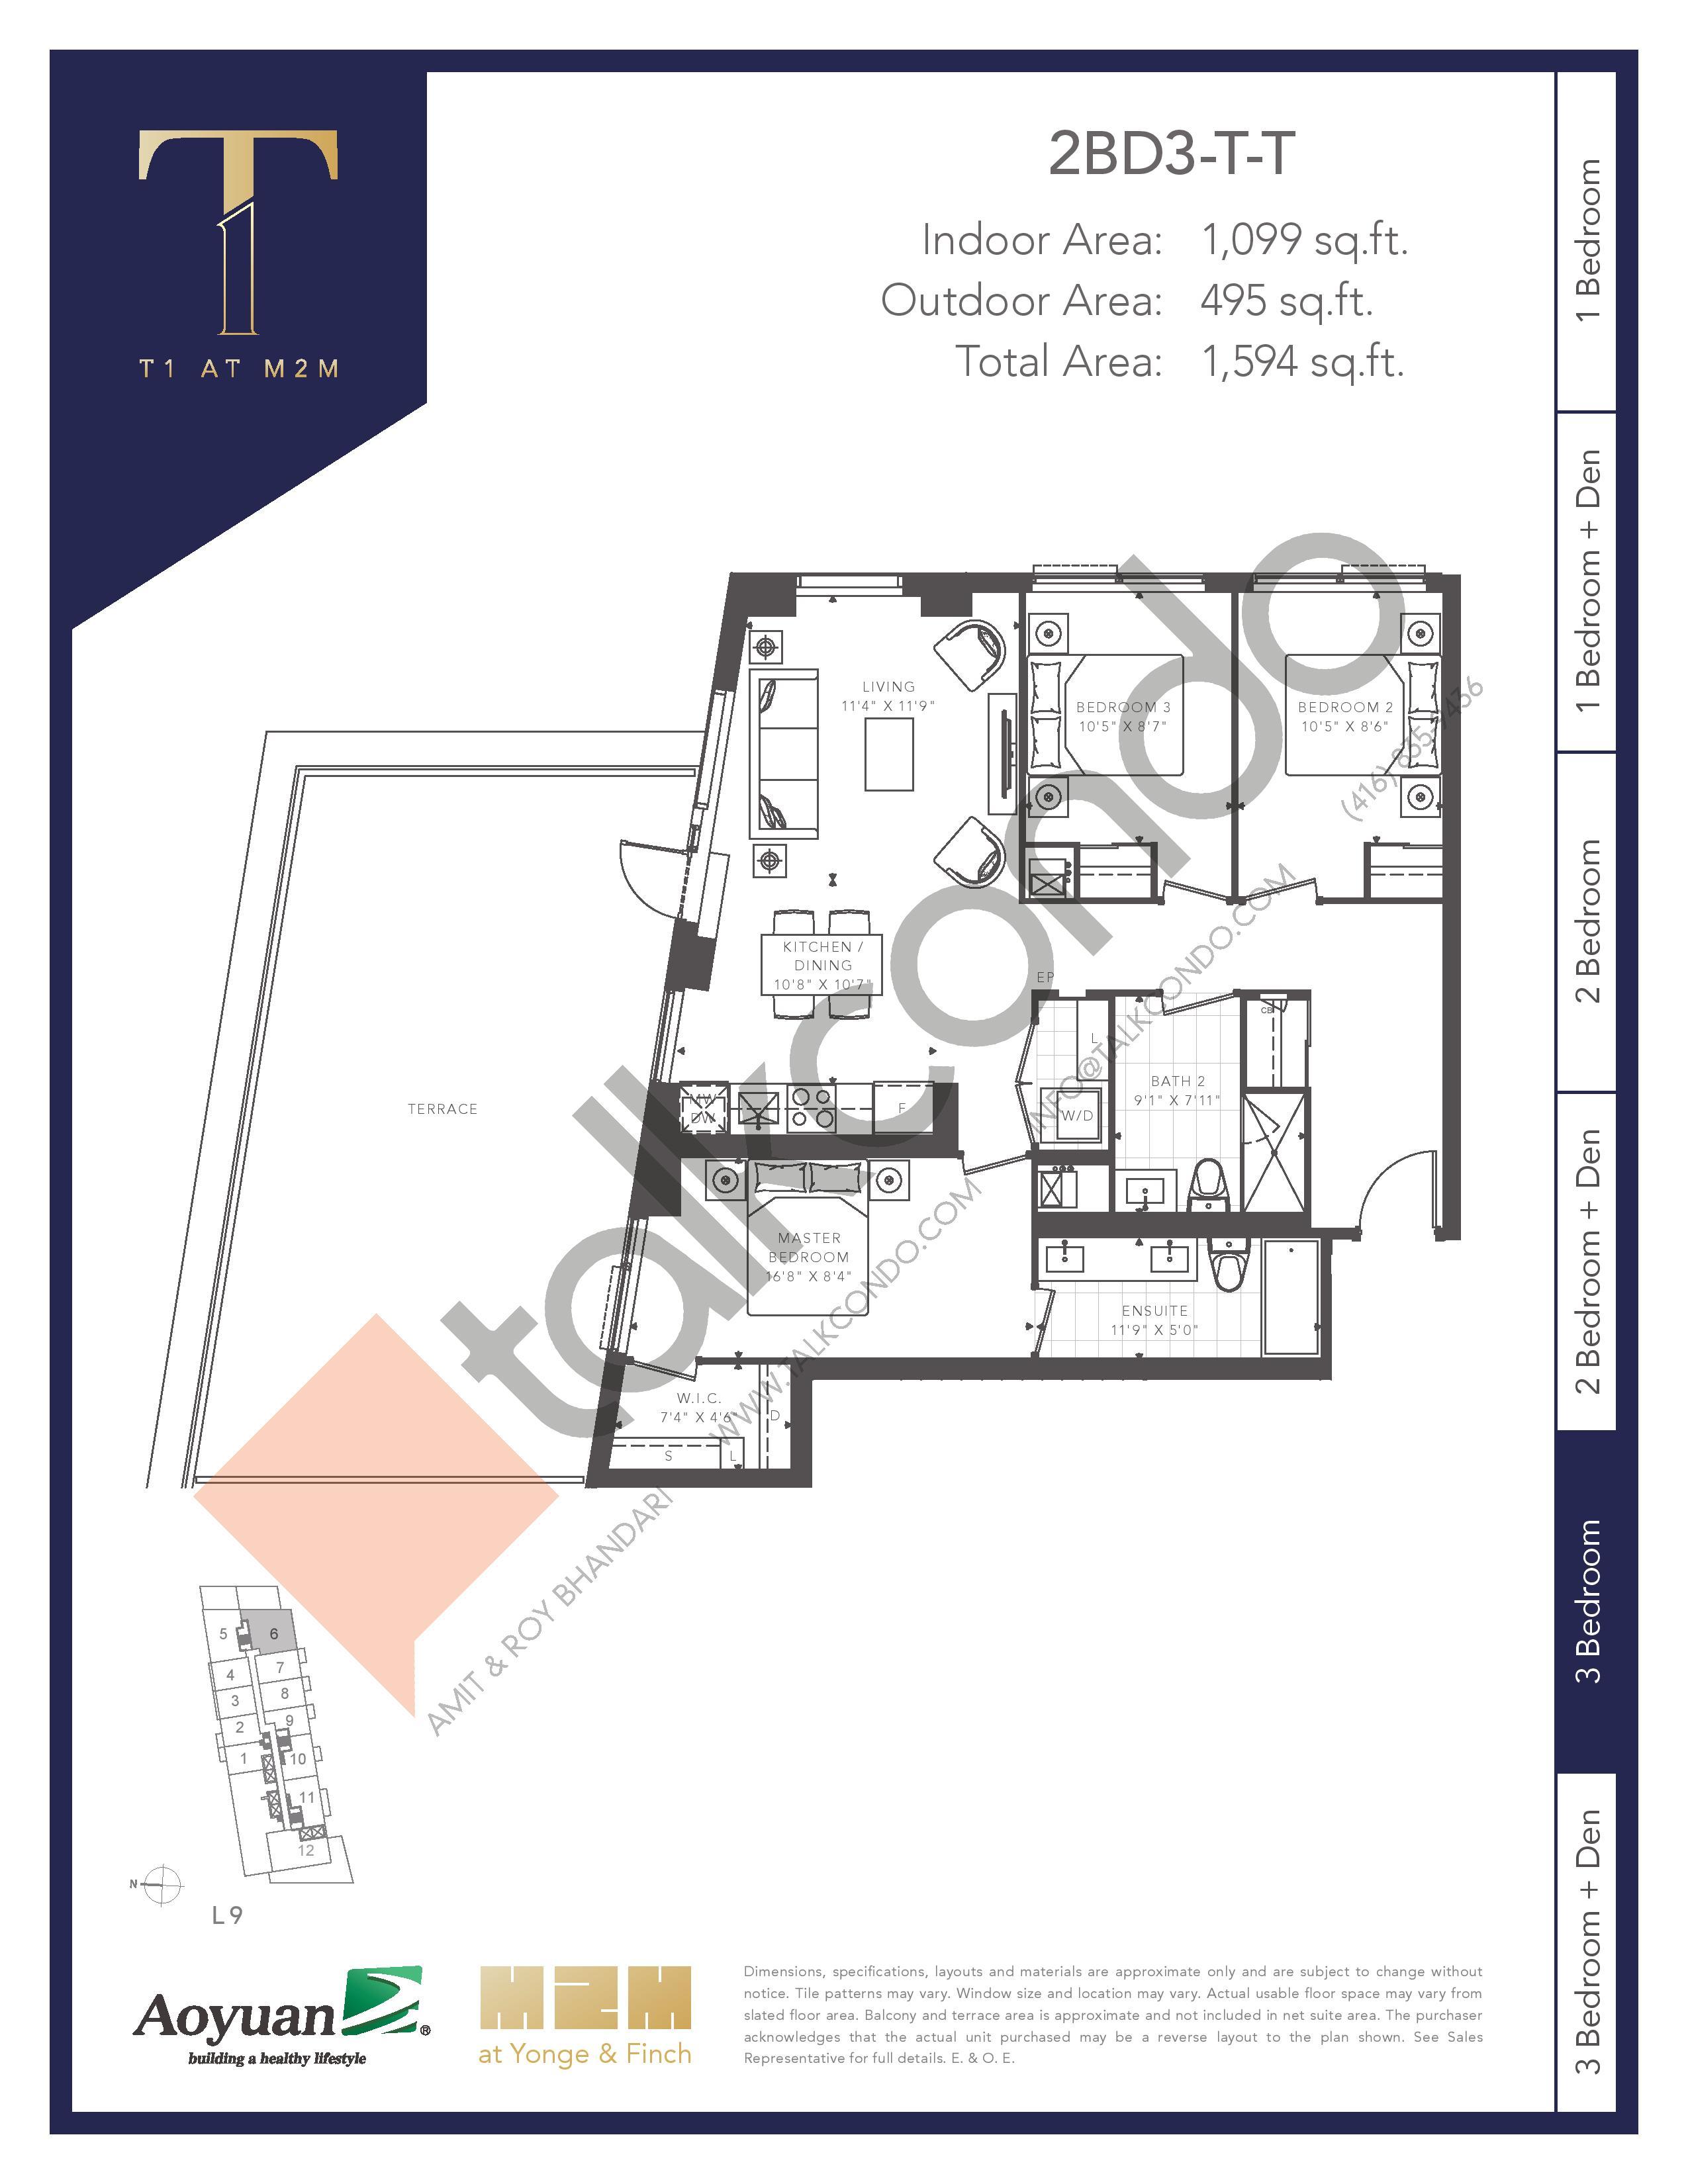 2BD3-T-T (Tower) Floor Plan at T1 at M2M Condos - 1099 sq.ft